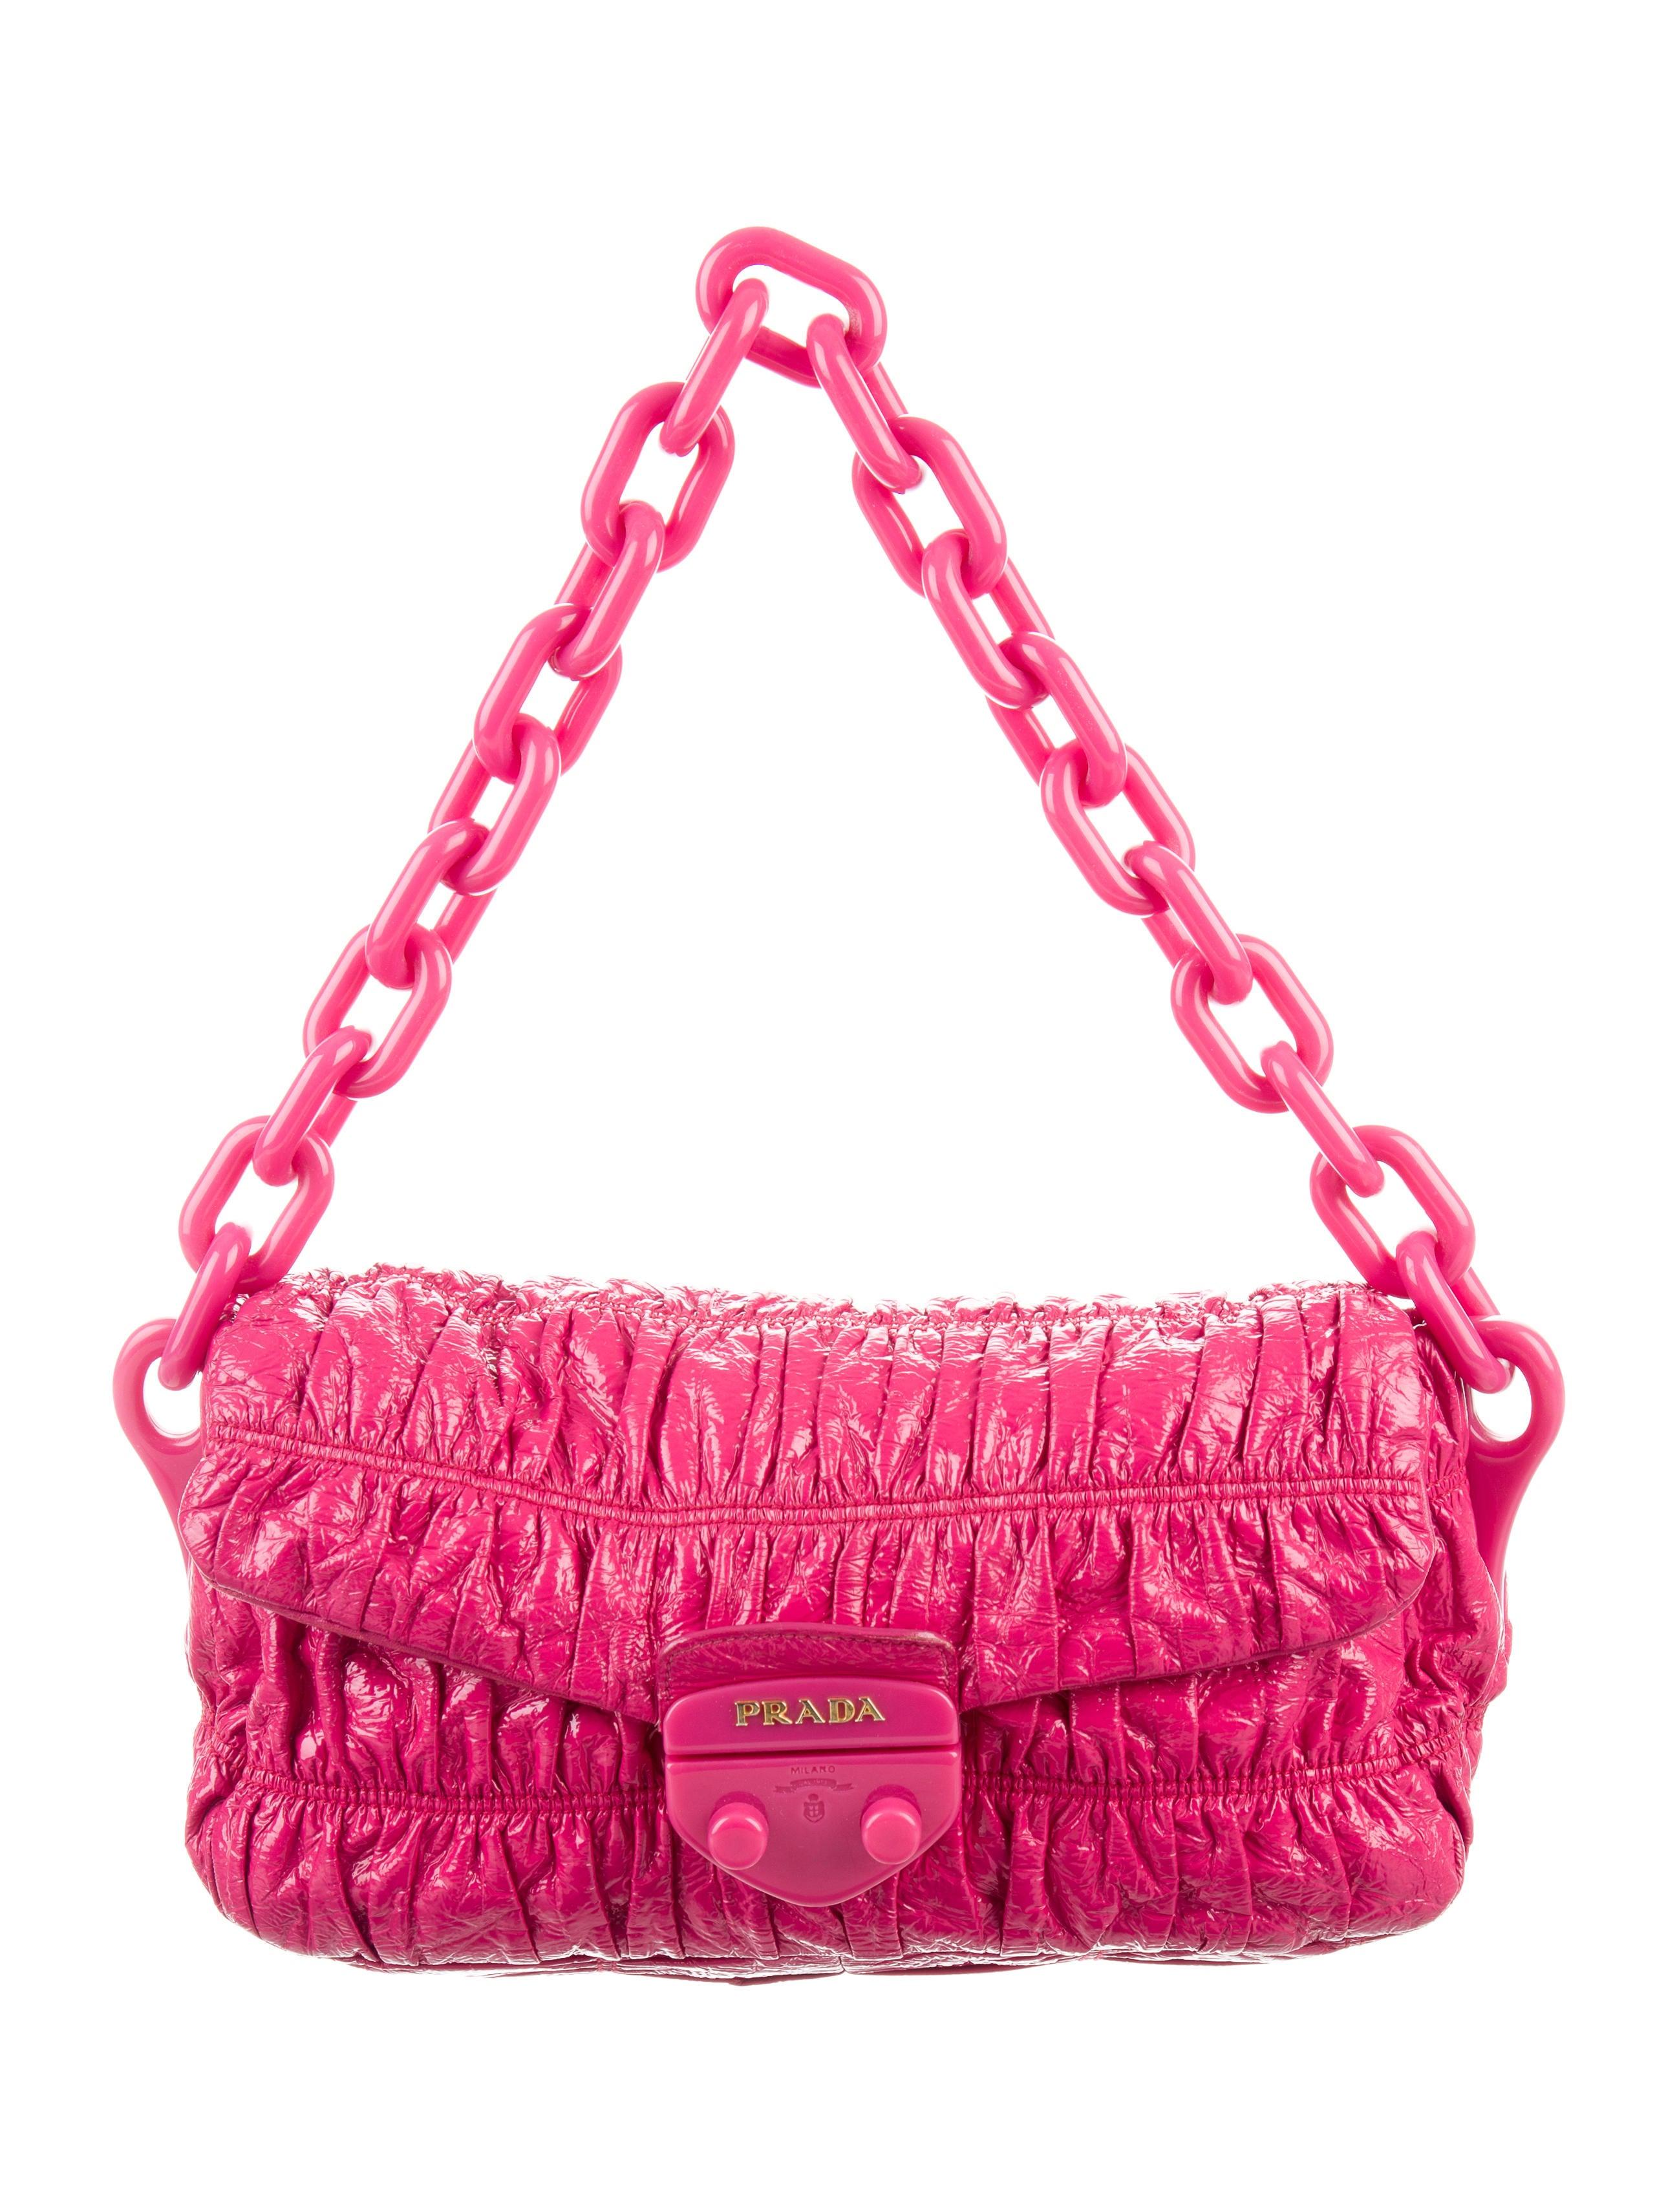 80c991bde8 Prada Vernice Gaufre Shoulder Bag - Handbags - PRA168664